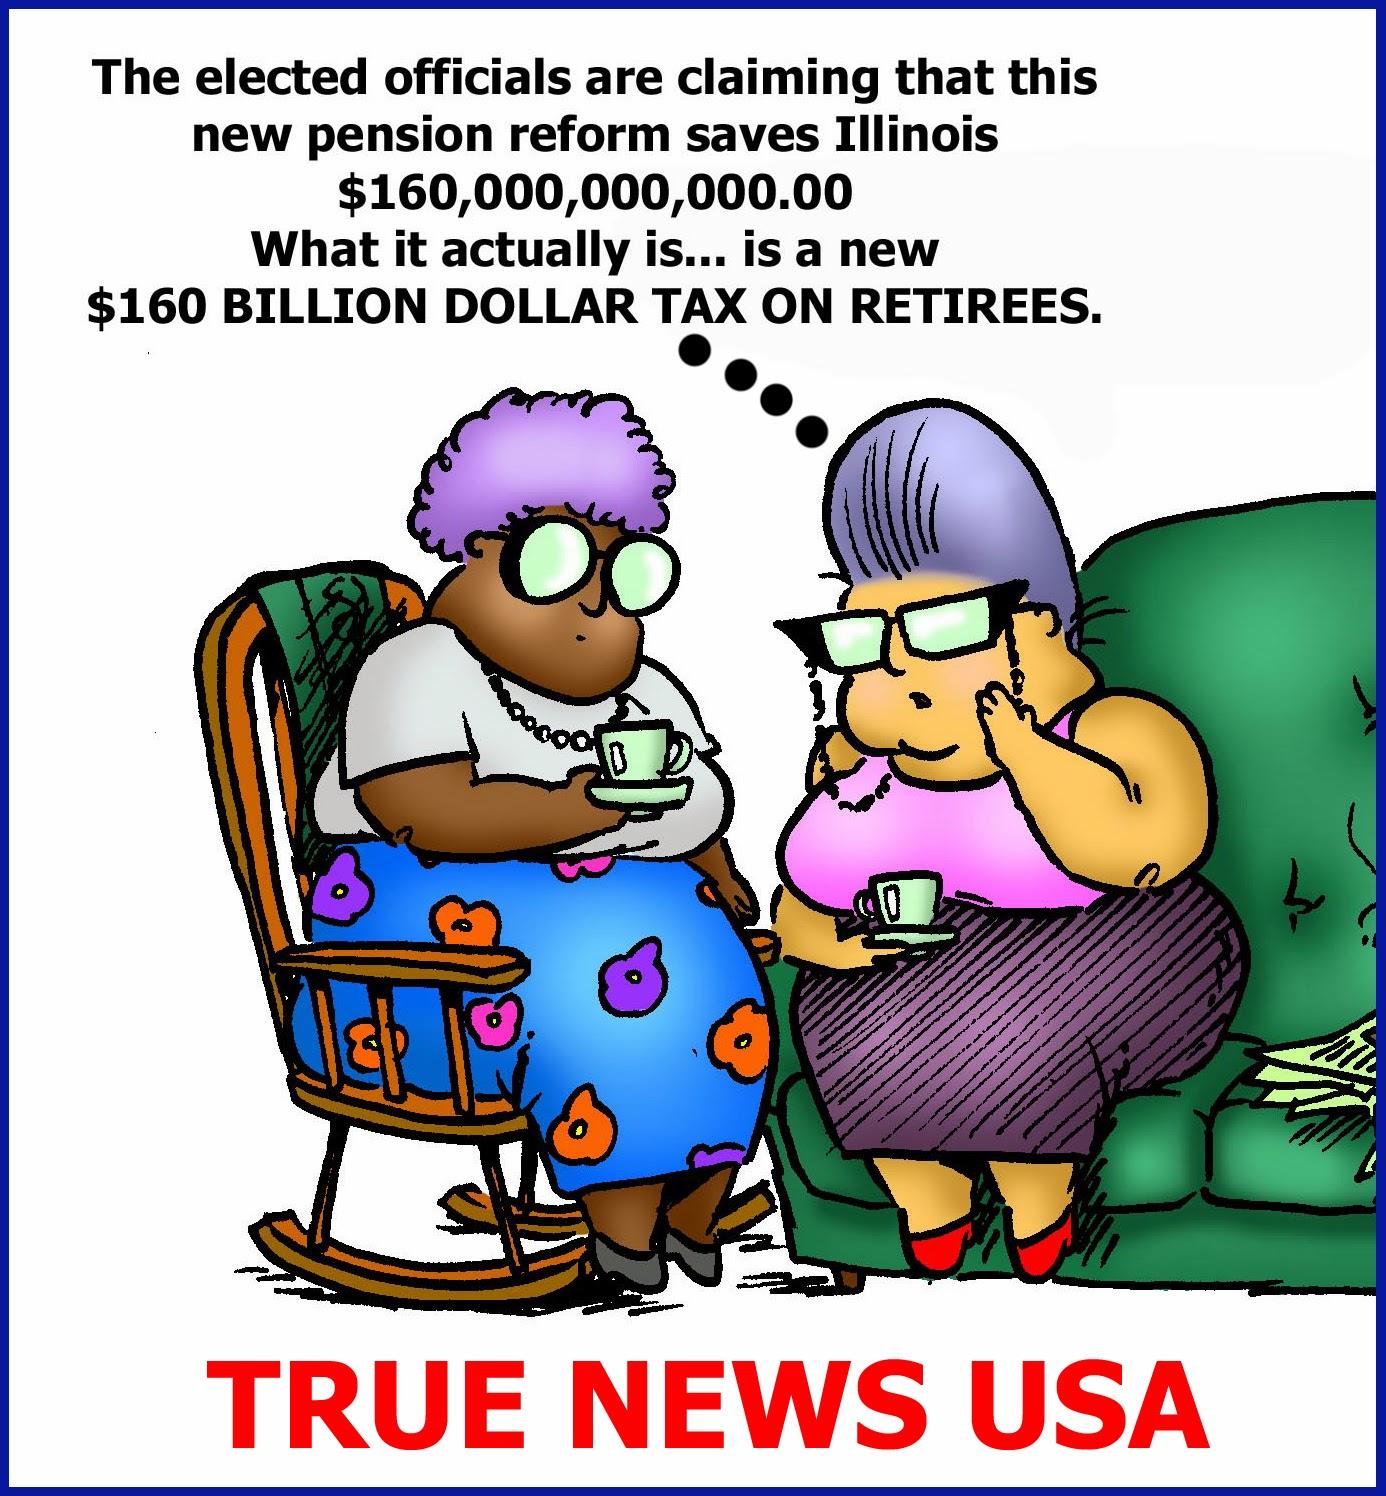 News USA: Illinois Pension Reform Cartoon of the Day - True News USA